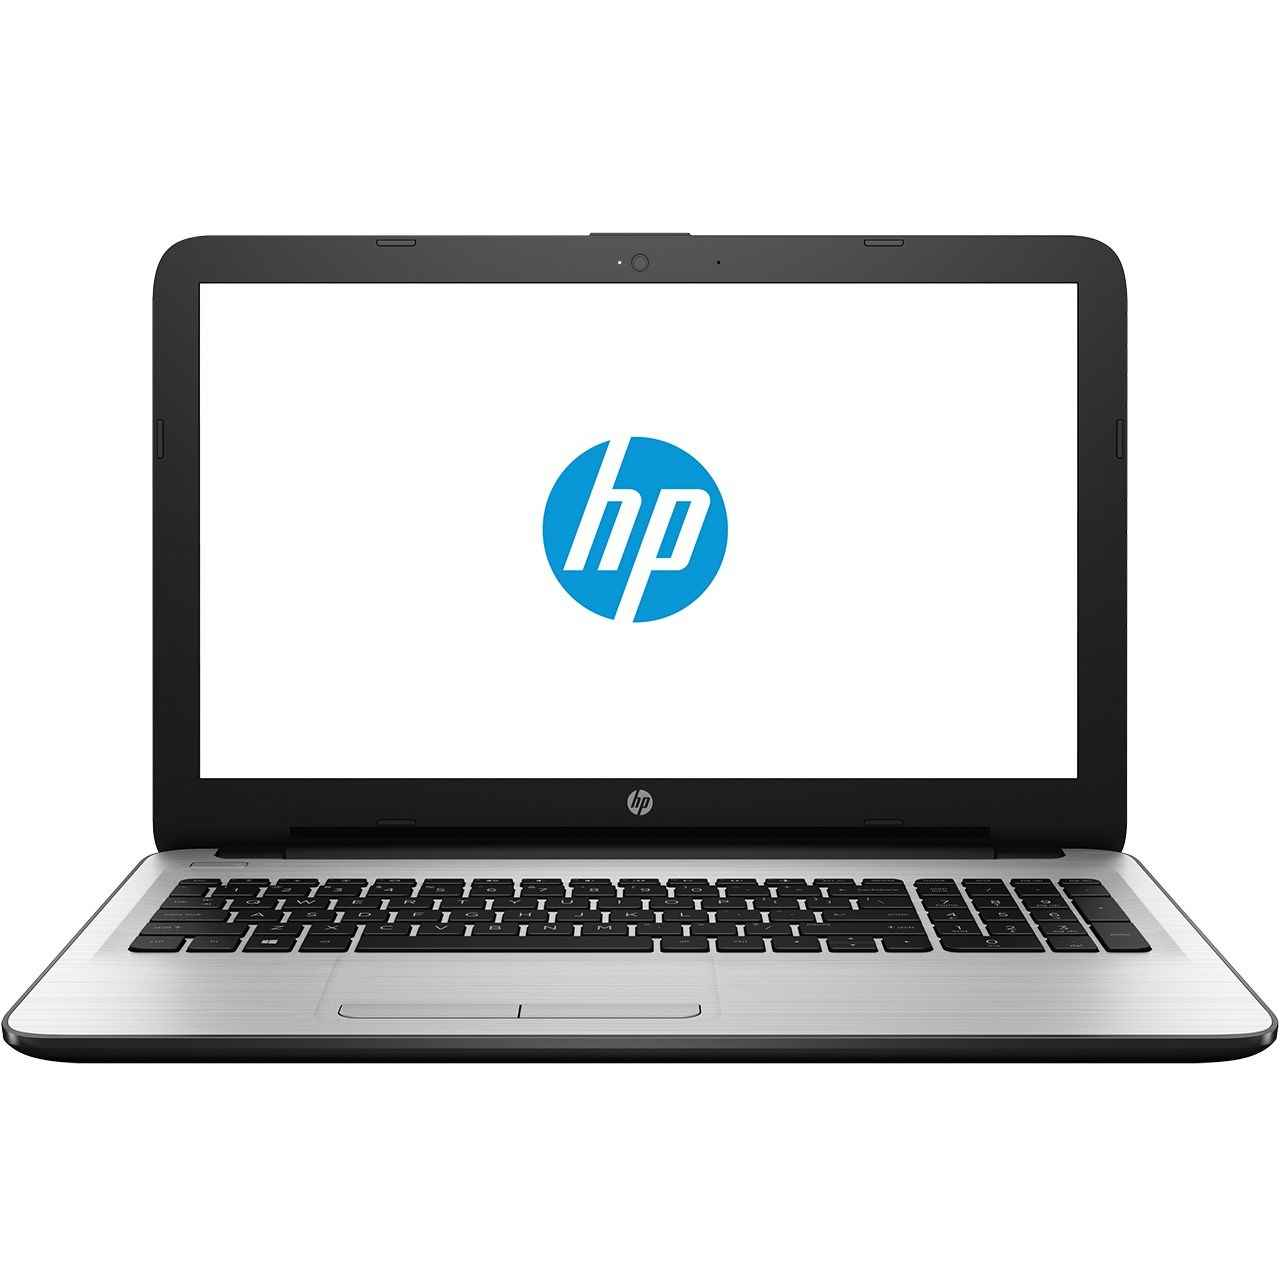 لپ تاپ استوک اچ پی مدل HP Ay116ne